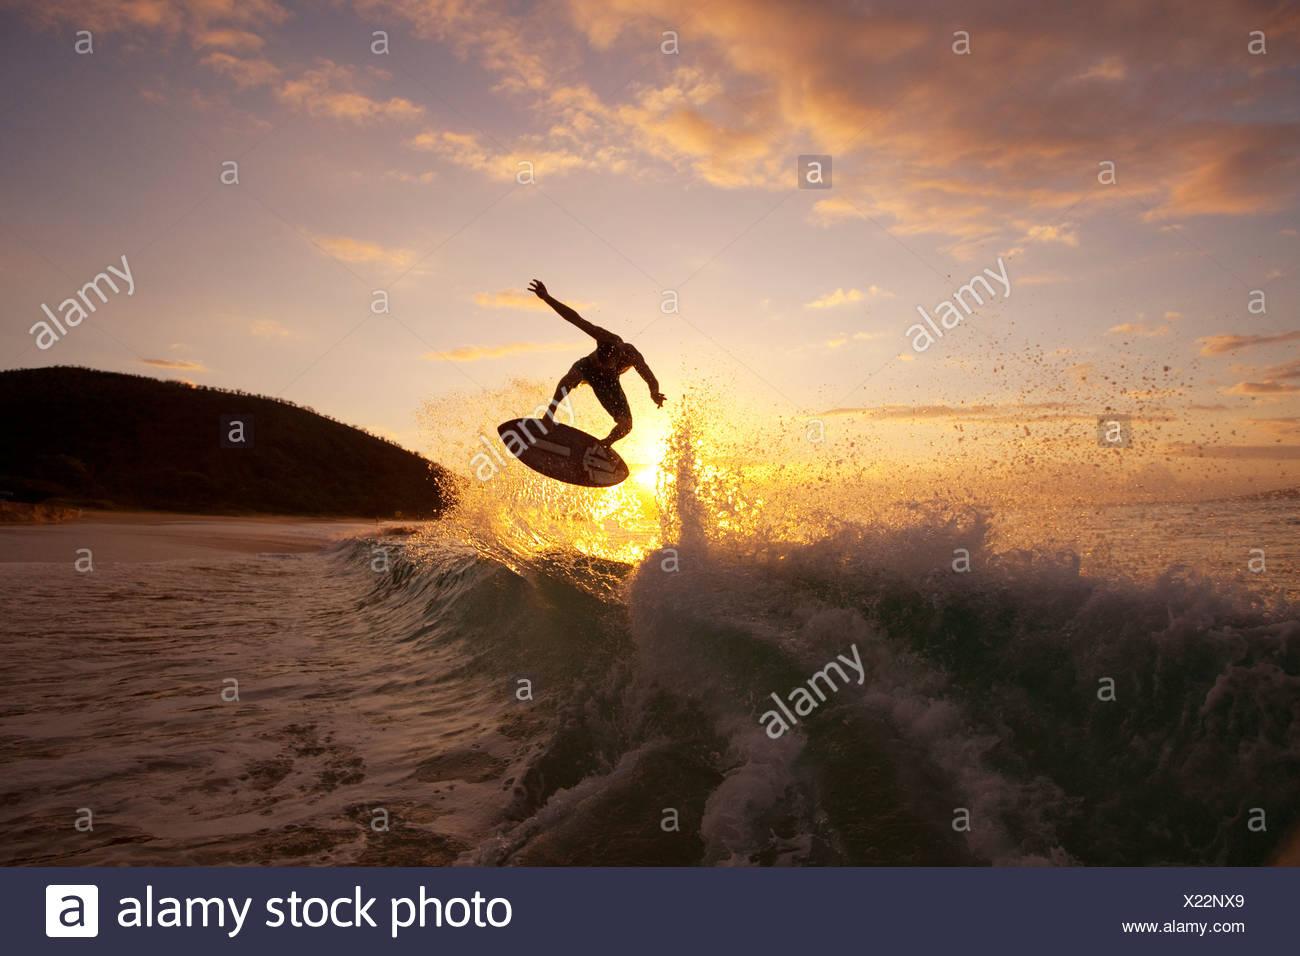 Hawaii, Maui, Makena, Skimboarder Gets Big Air Off A Wave At Sunset - Stock Image